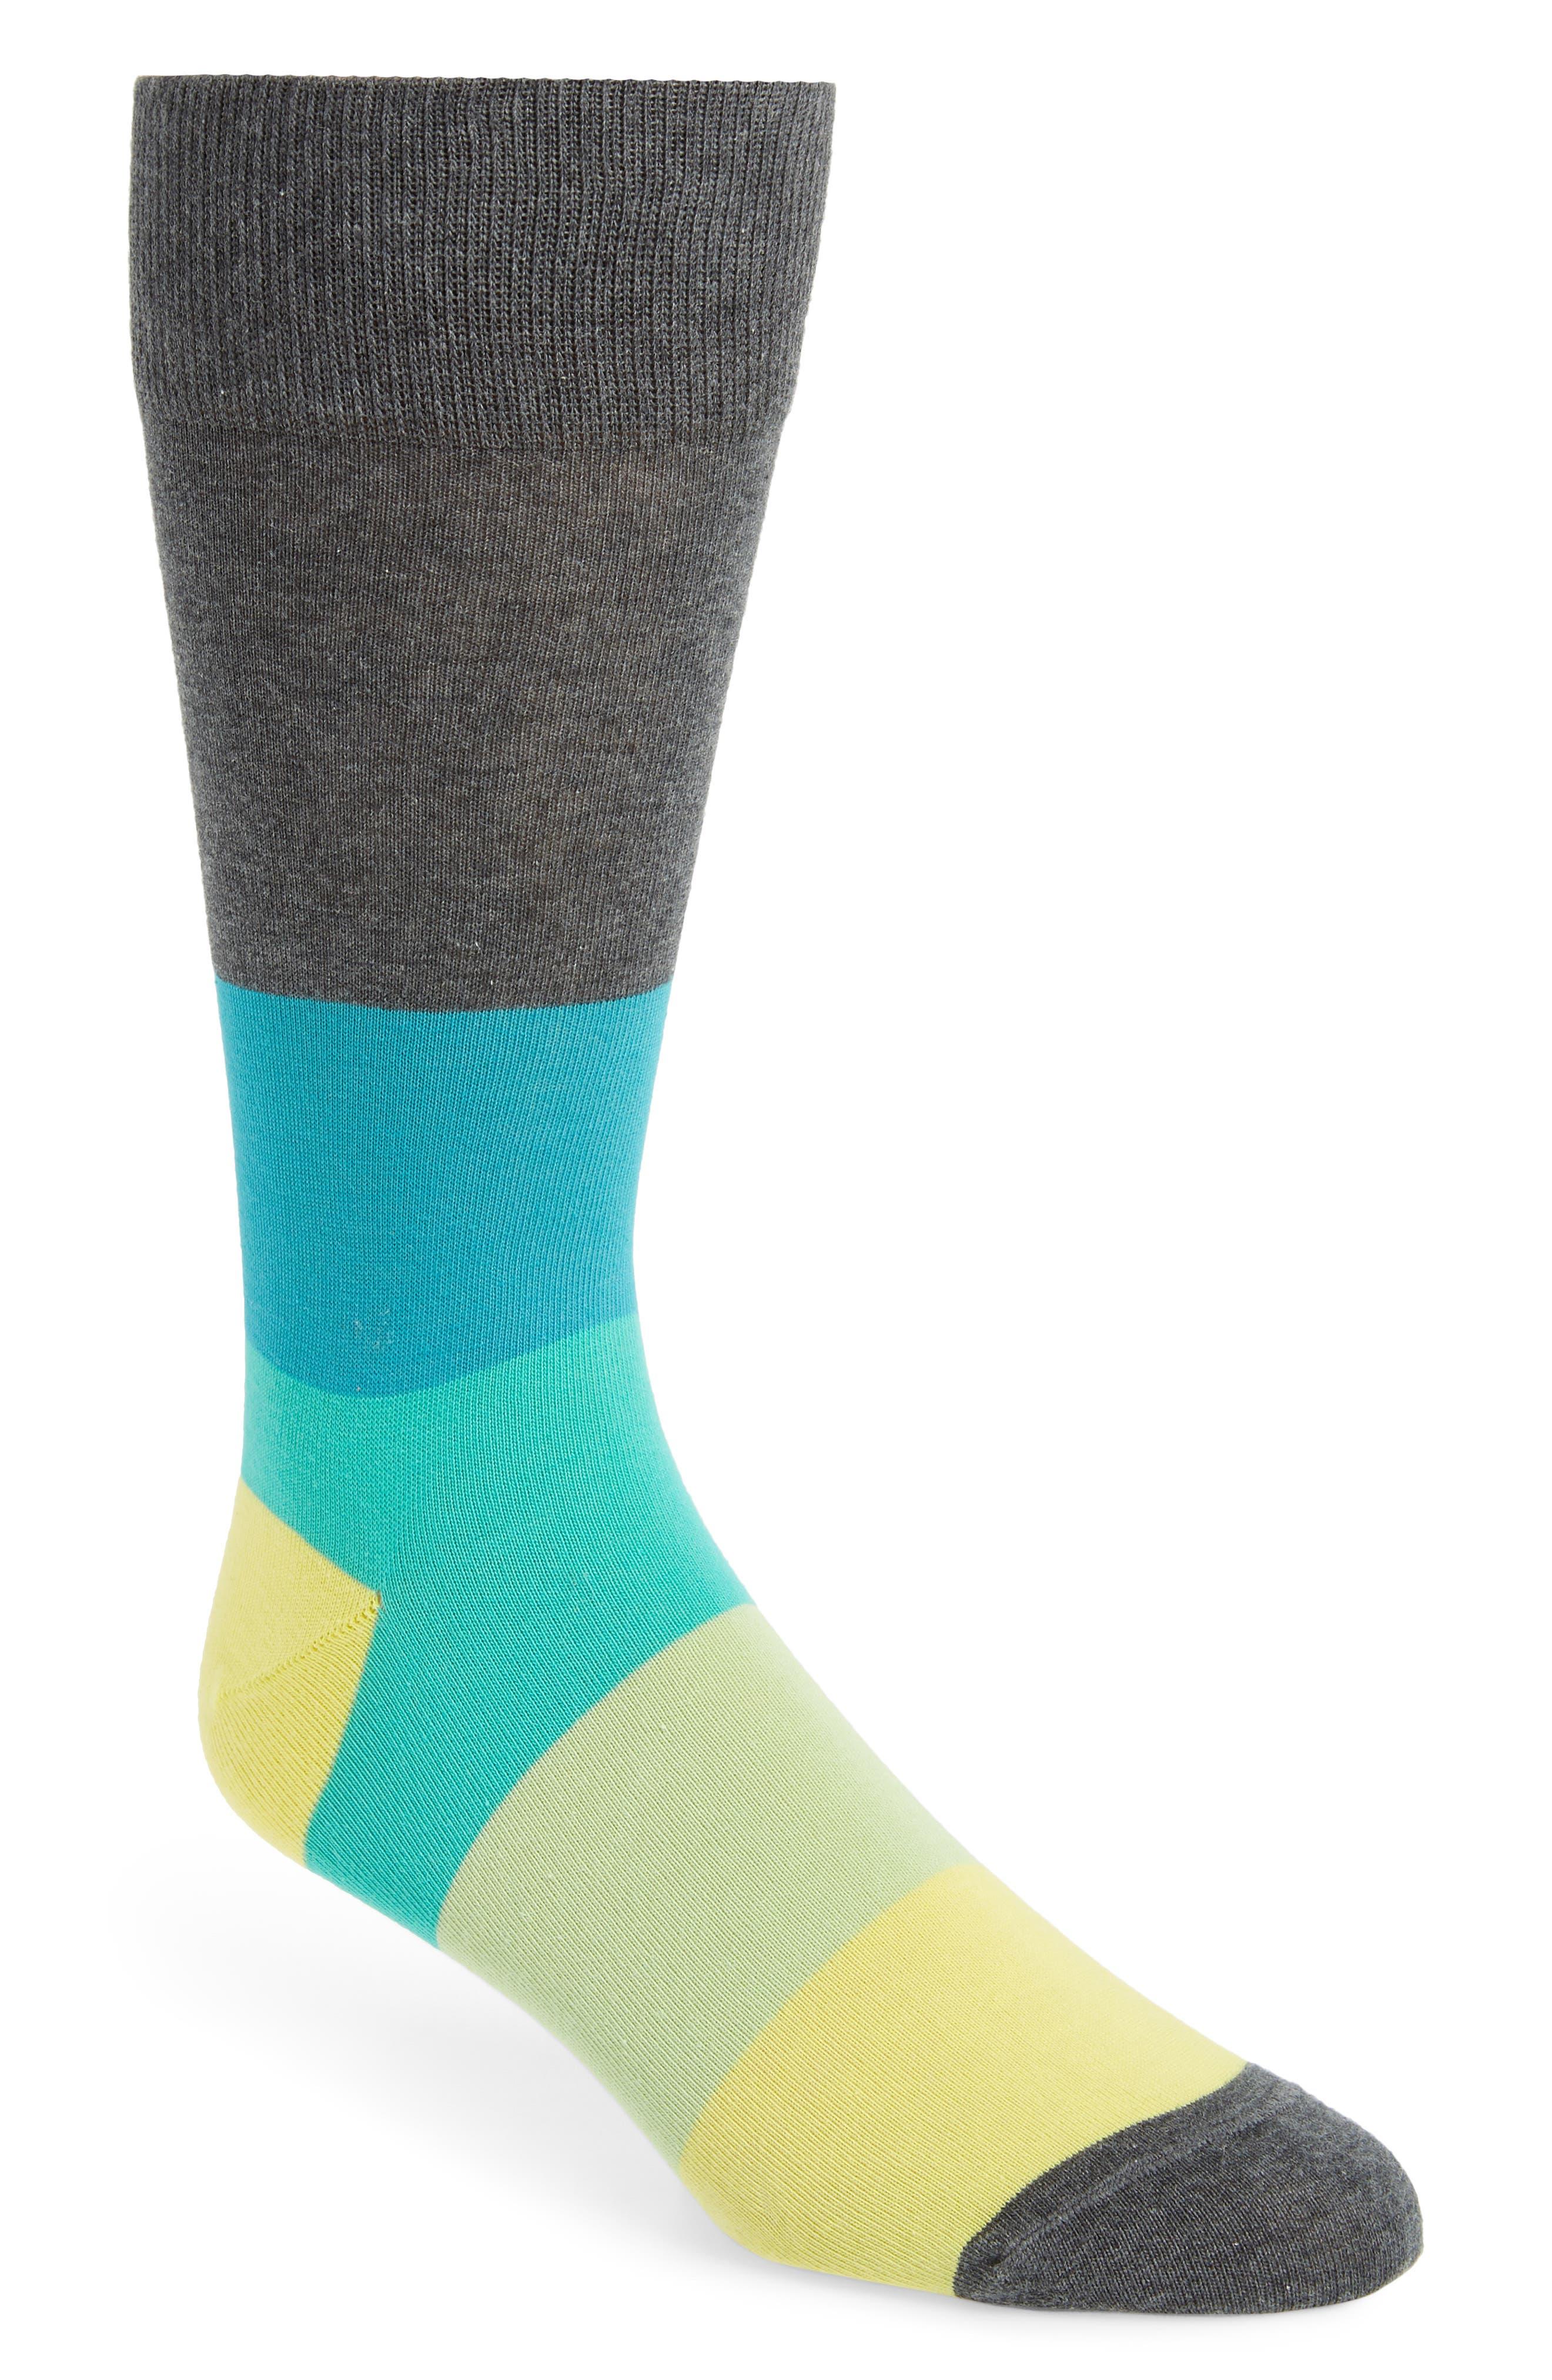 Calibrate Blocked Ombré Socks